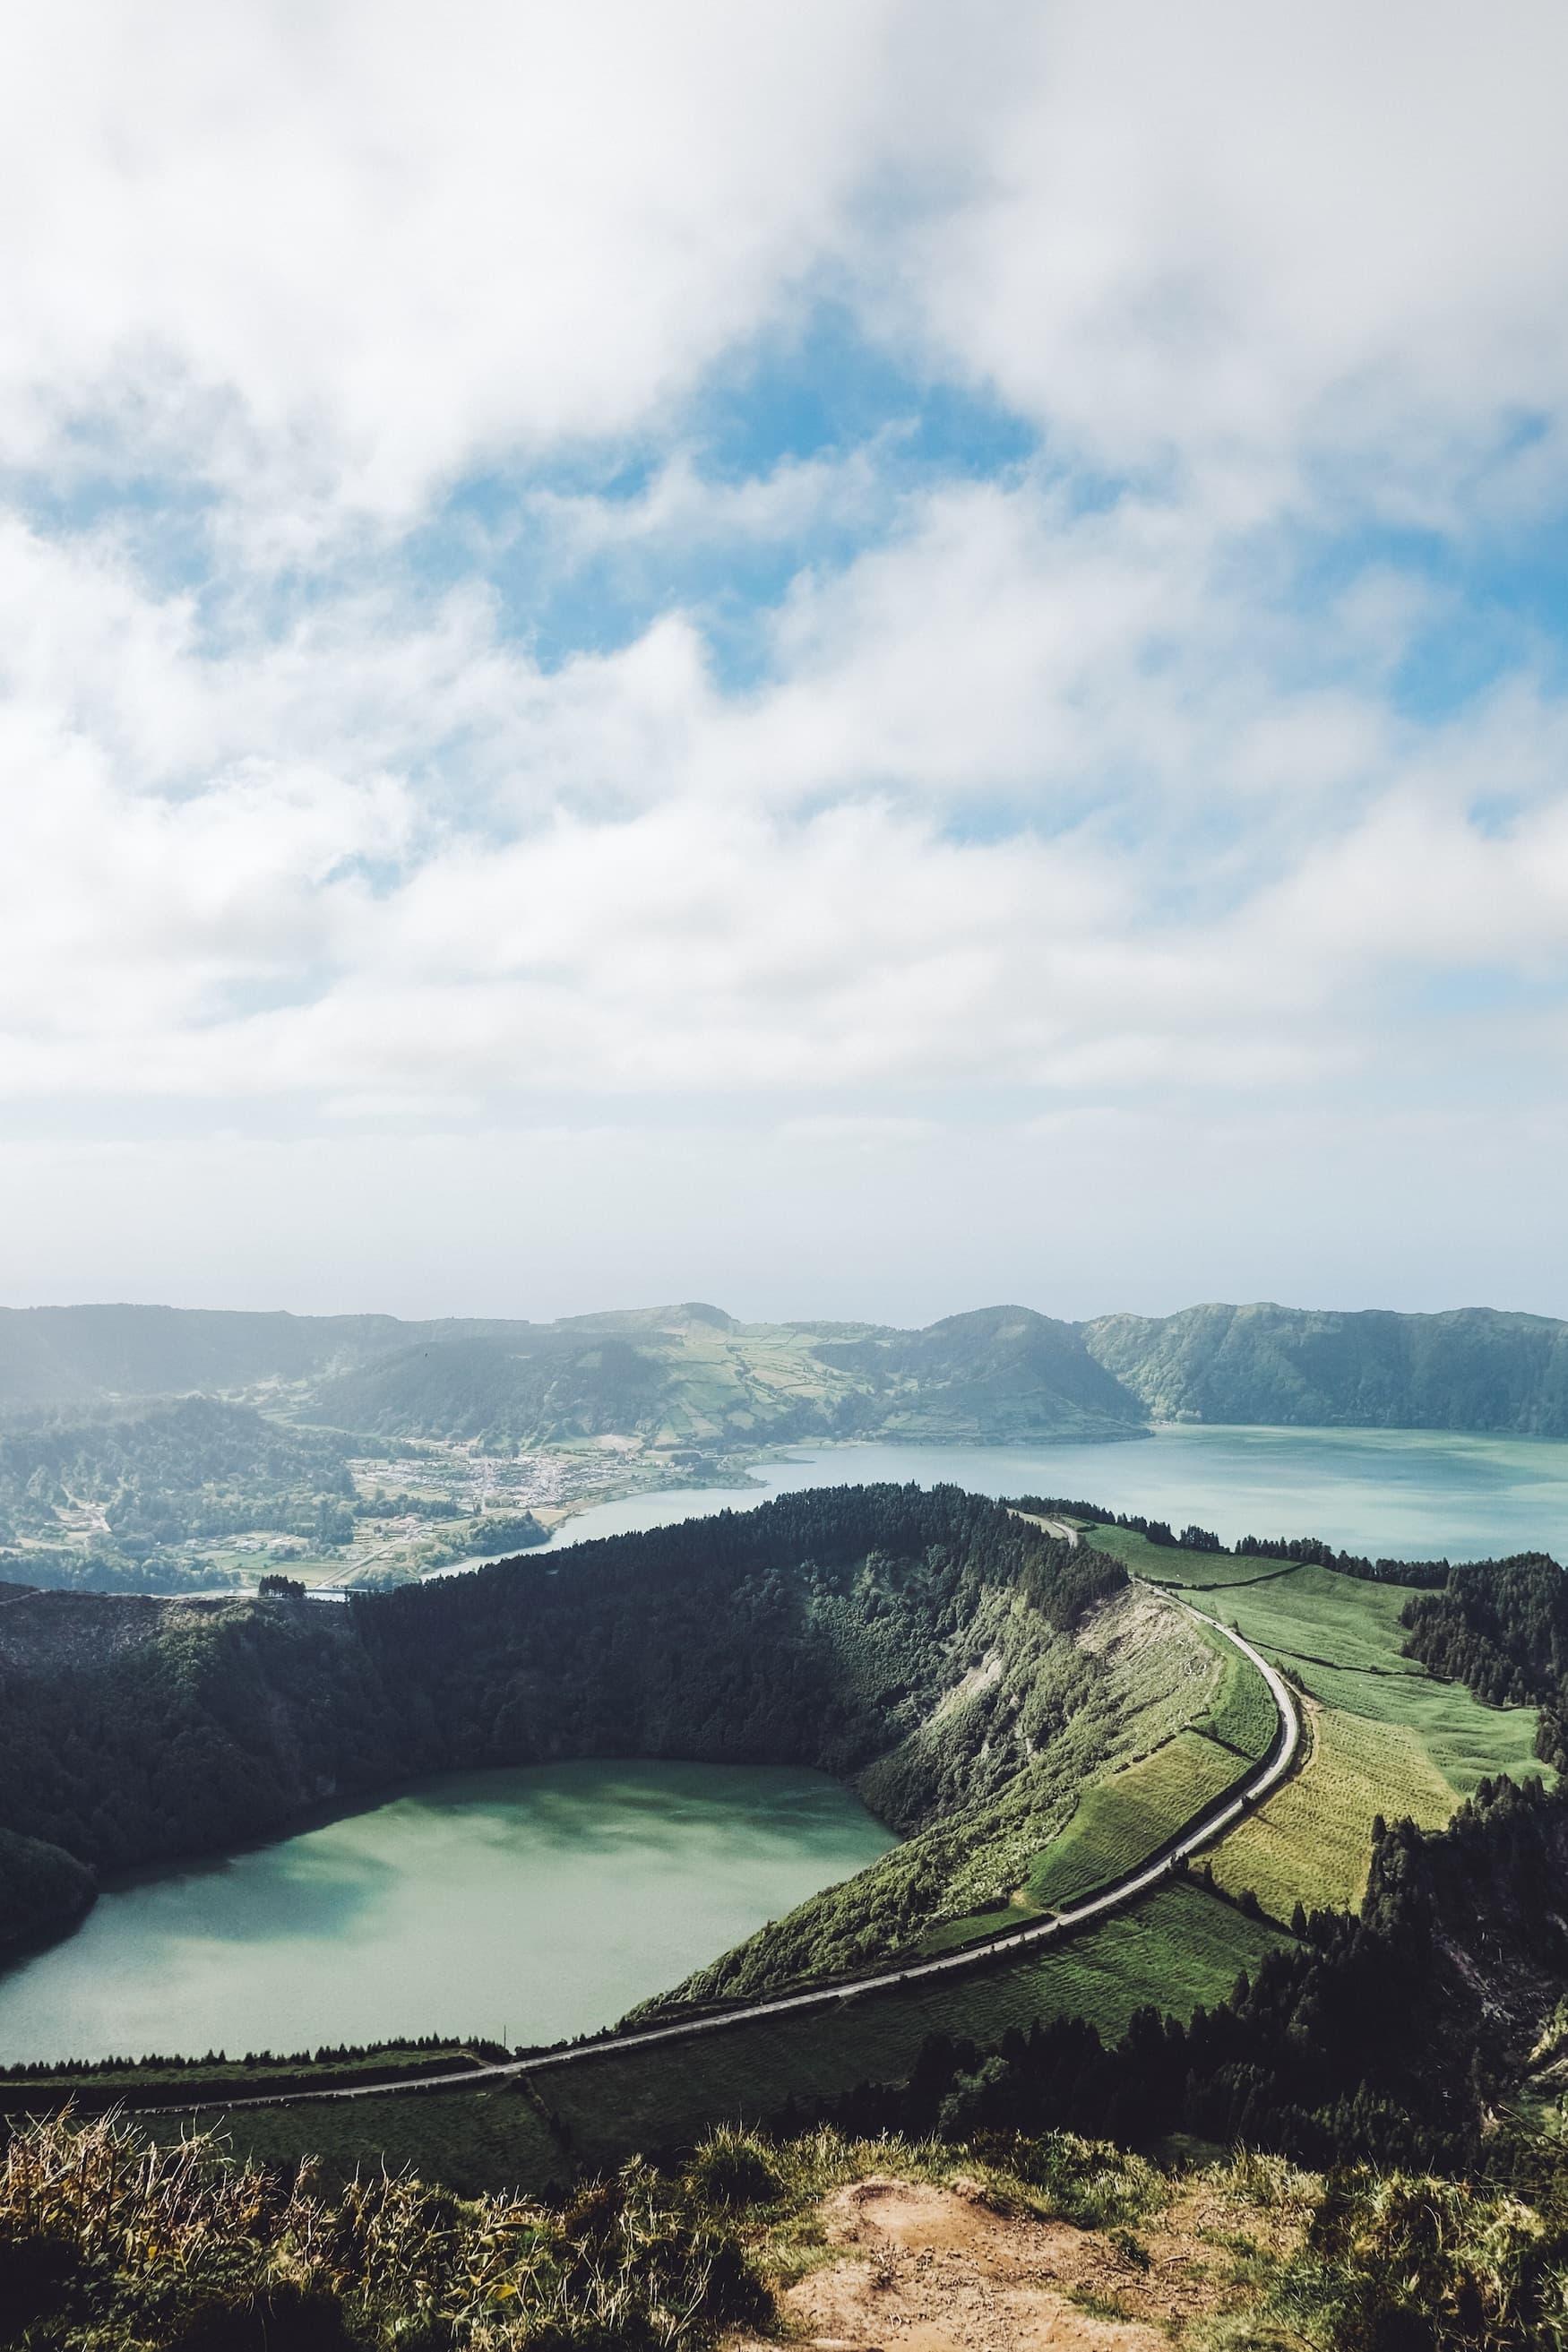 Vulkankrater auf den Azoren